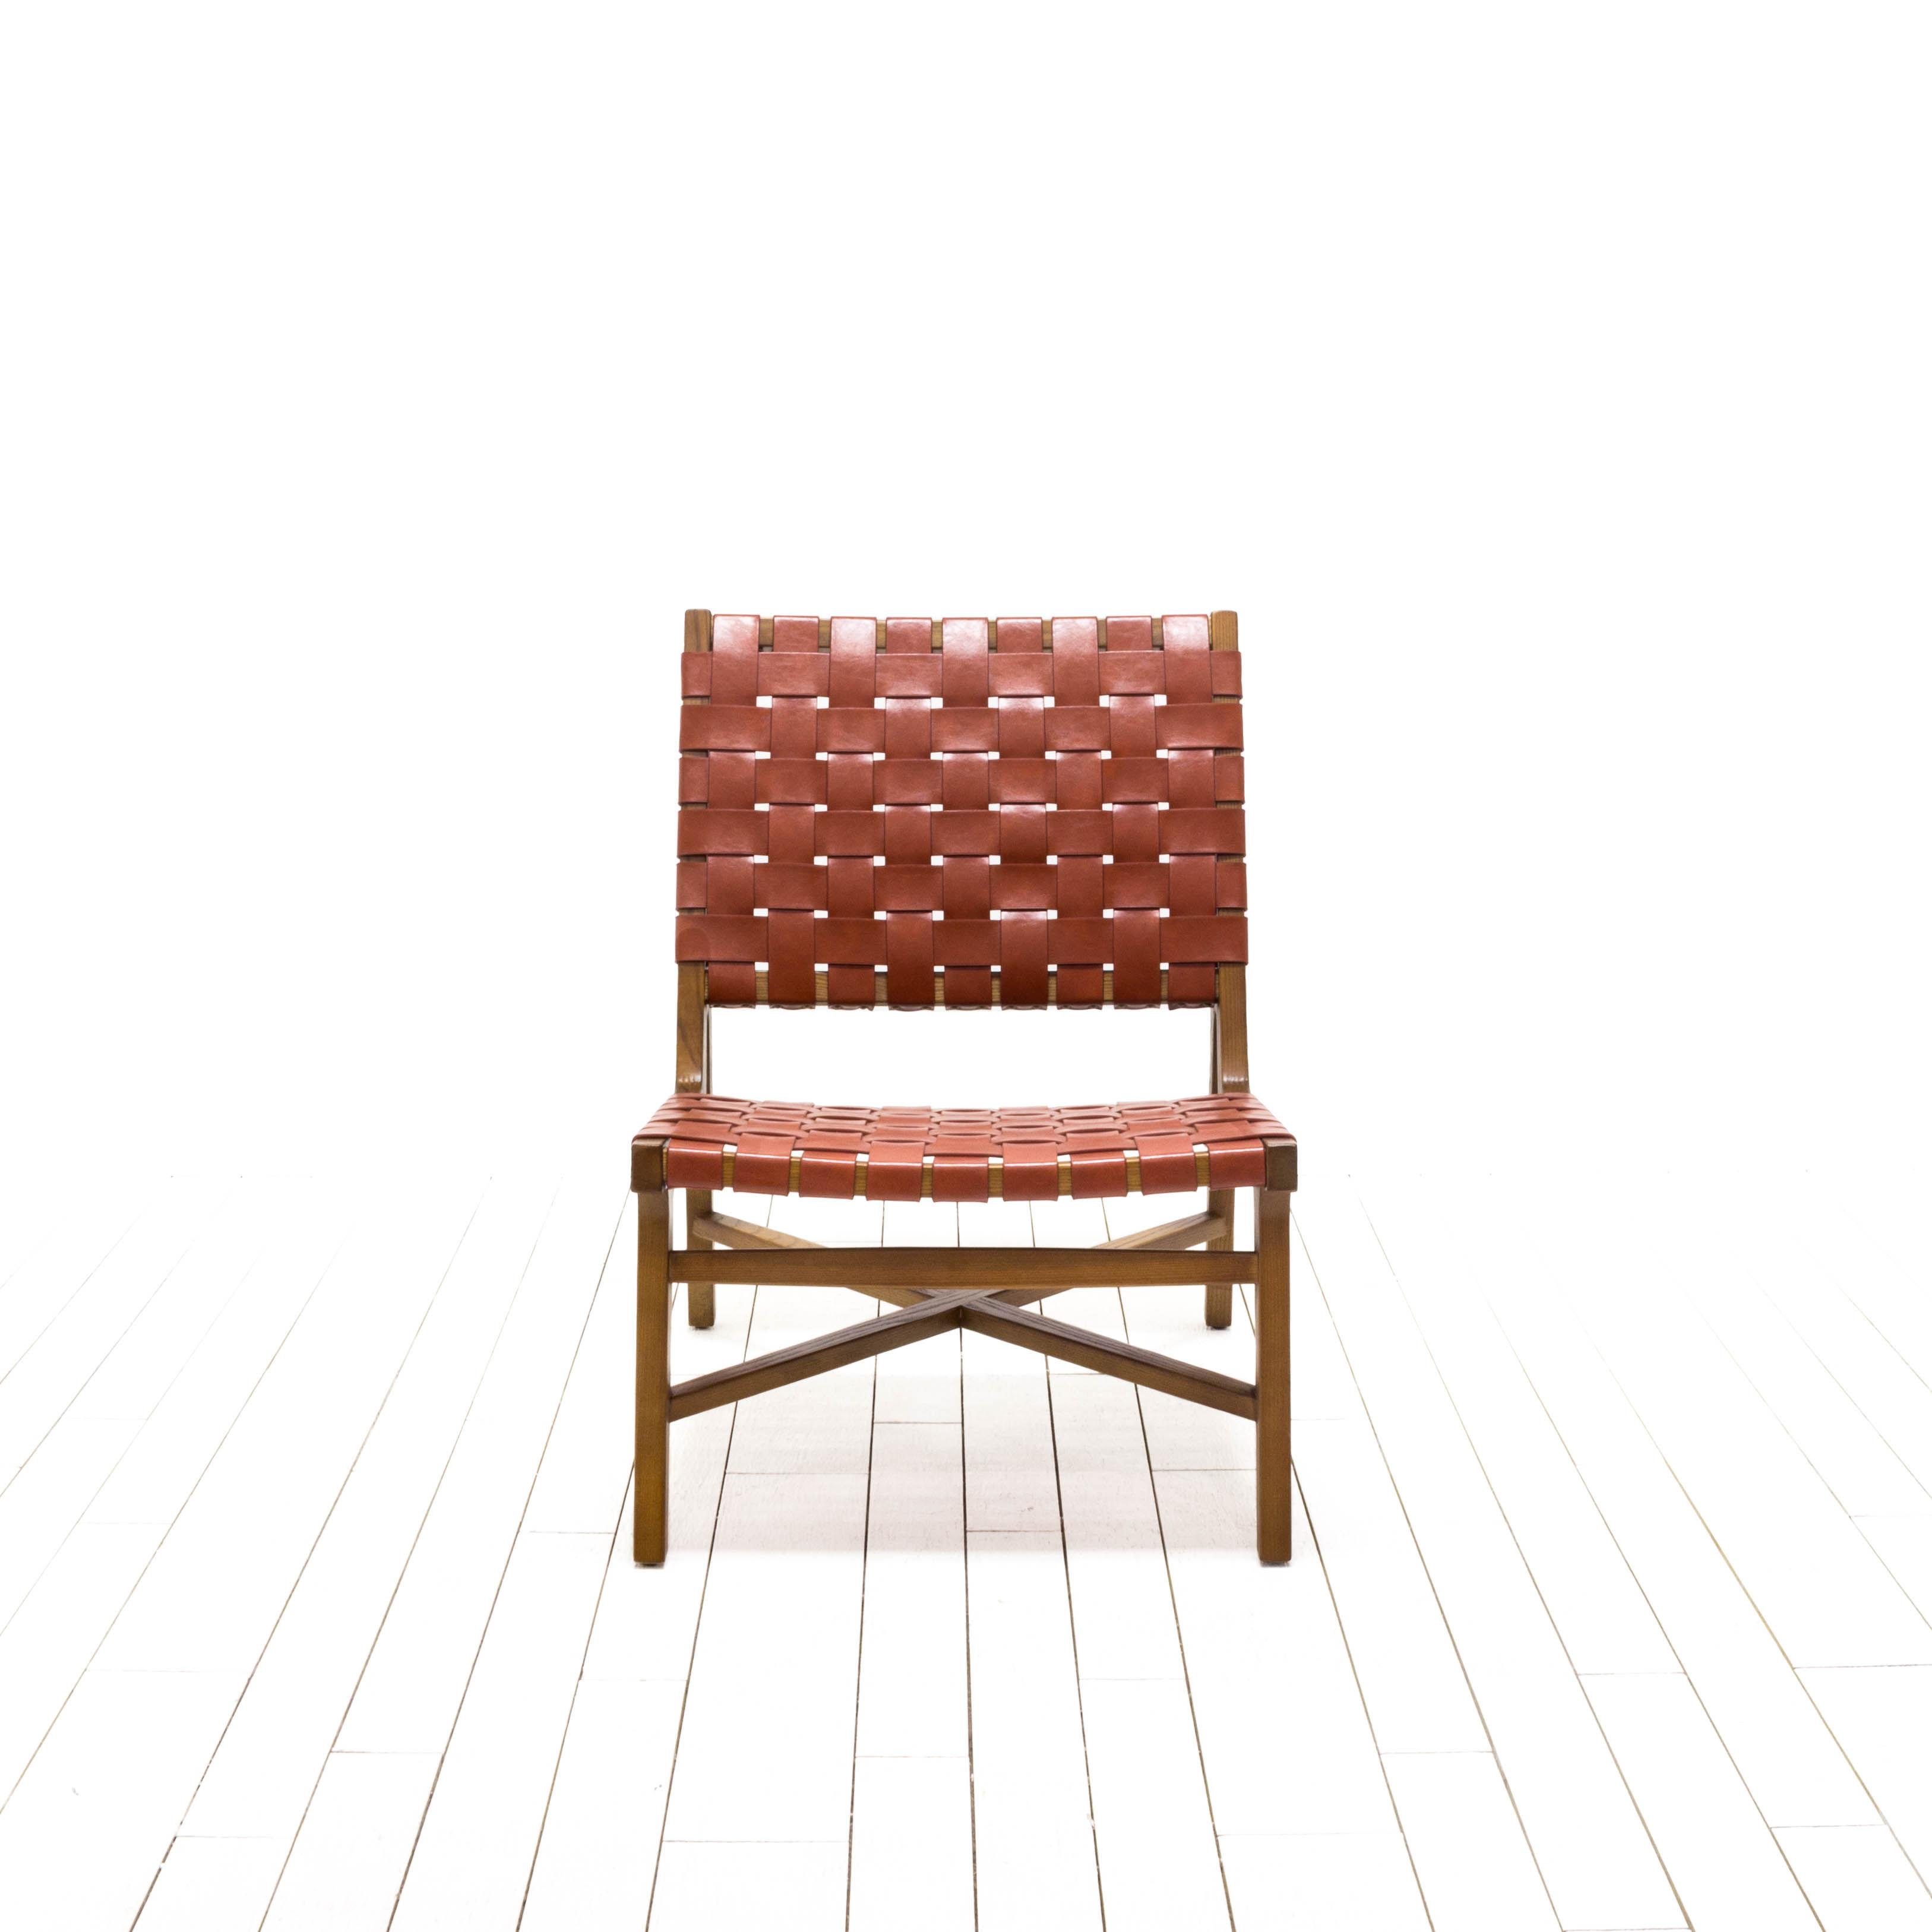 Jarrett Chairs